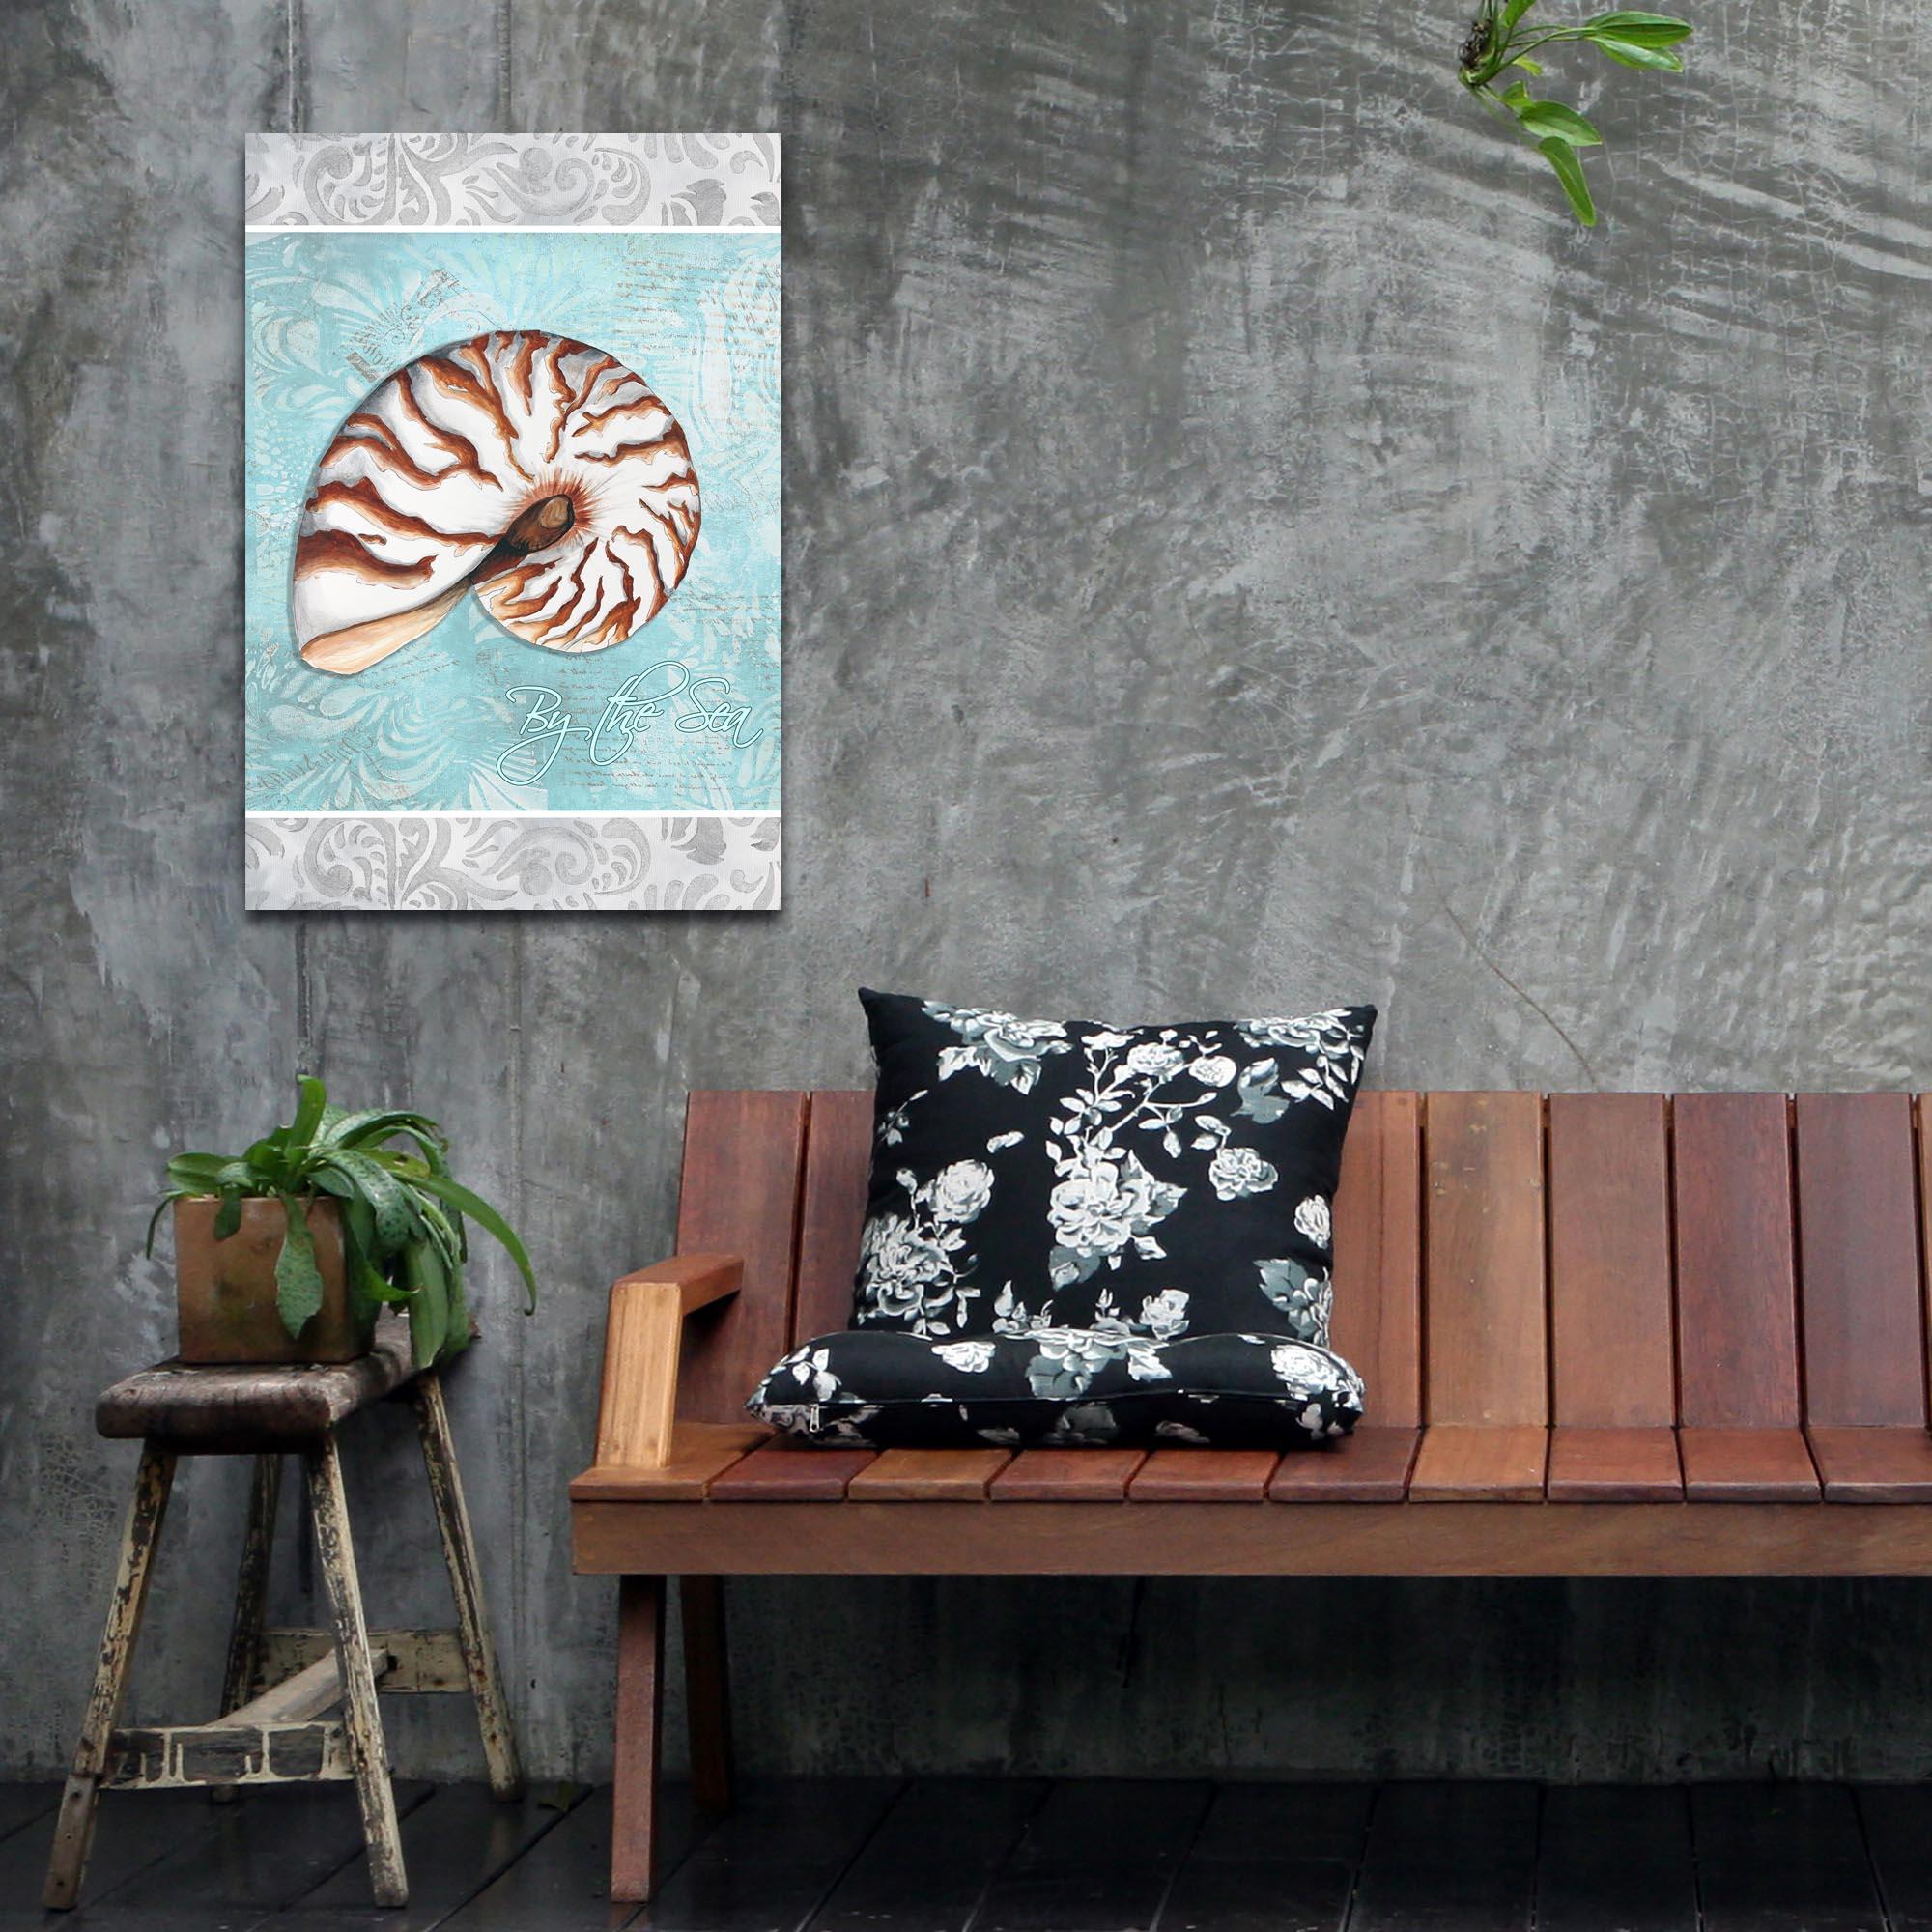 Beach Decor 'By the Sea v1' - Coastal Bathroom Art on Metal or Acrylic - Lifestyle View